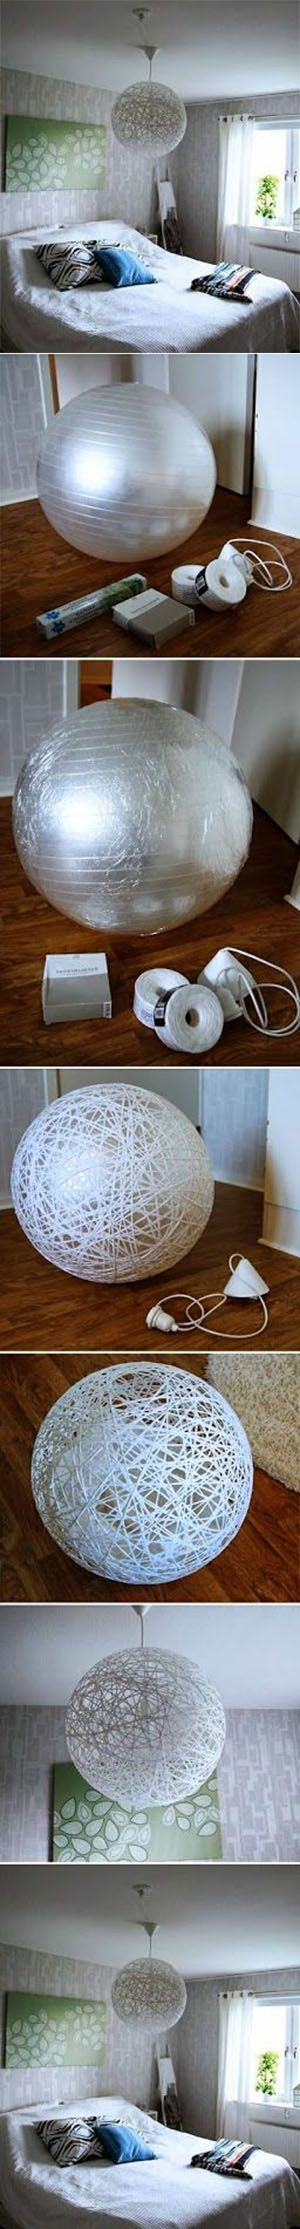 Cool Ball Light | DIY & Crafts Tutorials